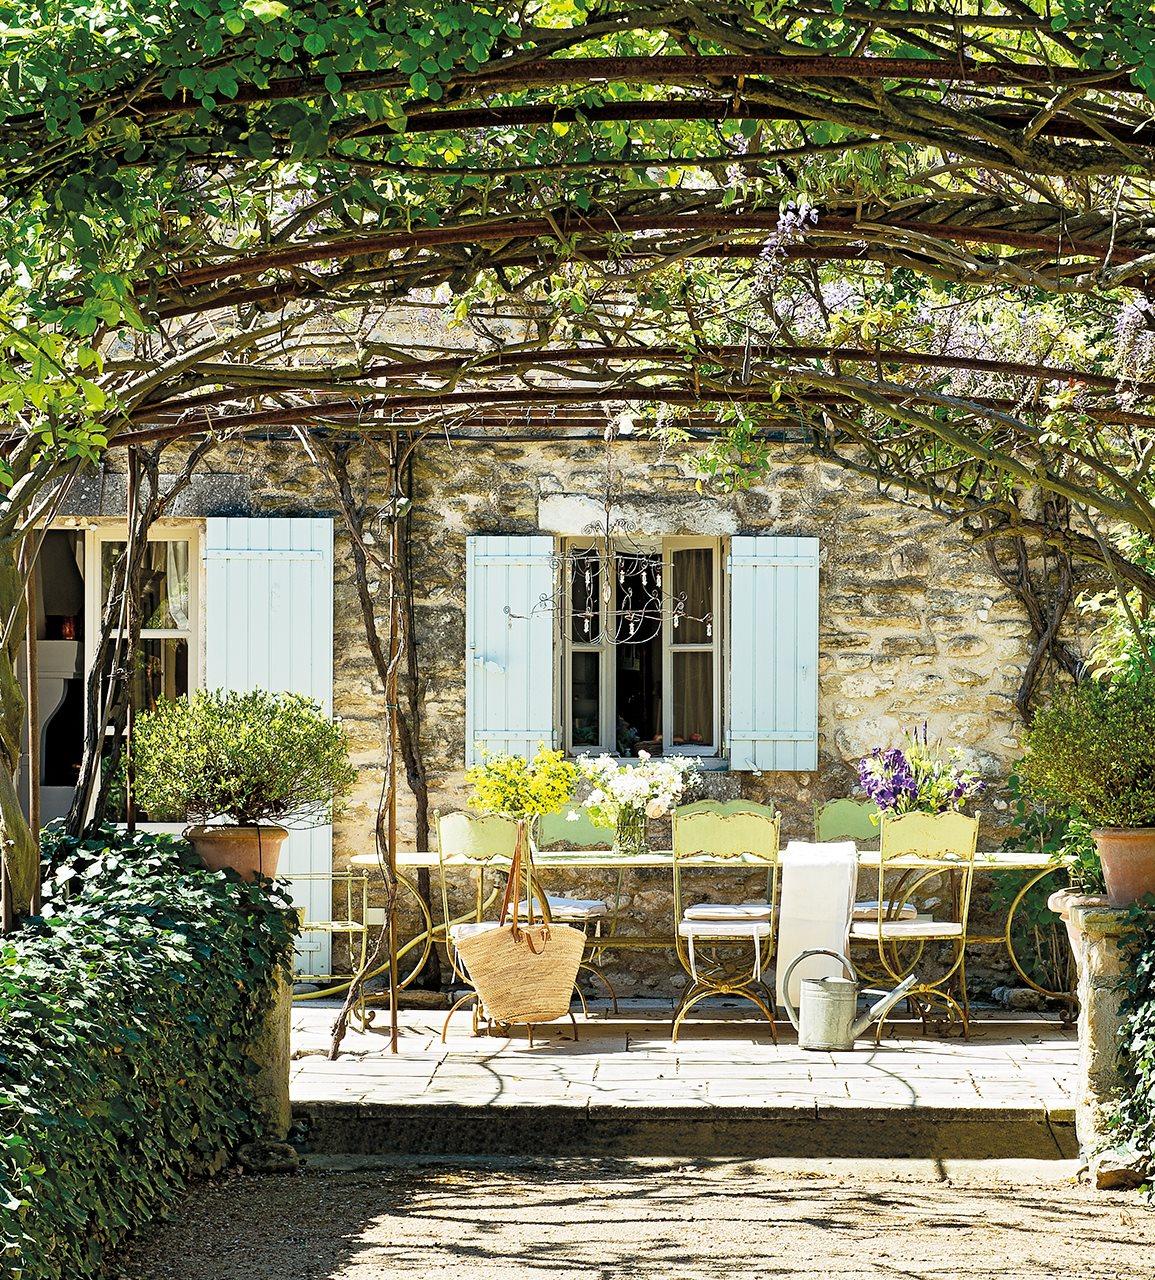 comedor exterior con mesa y sillas de hierro antiguas 1155x1280 - La Ferme du Bon Dieu: A farm converted into a house which holds a love story